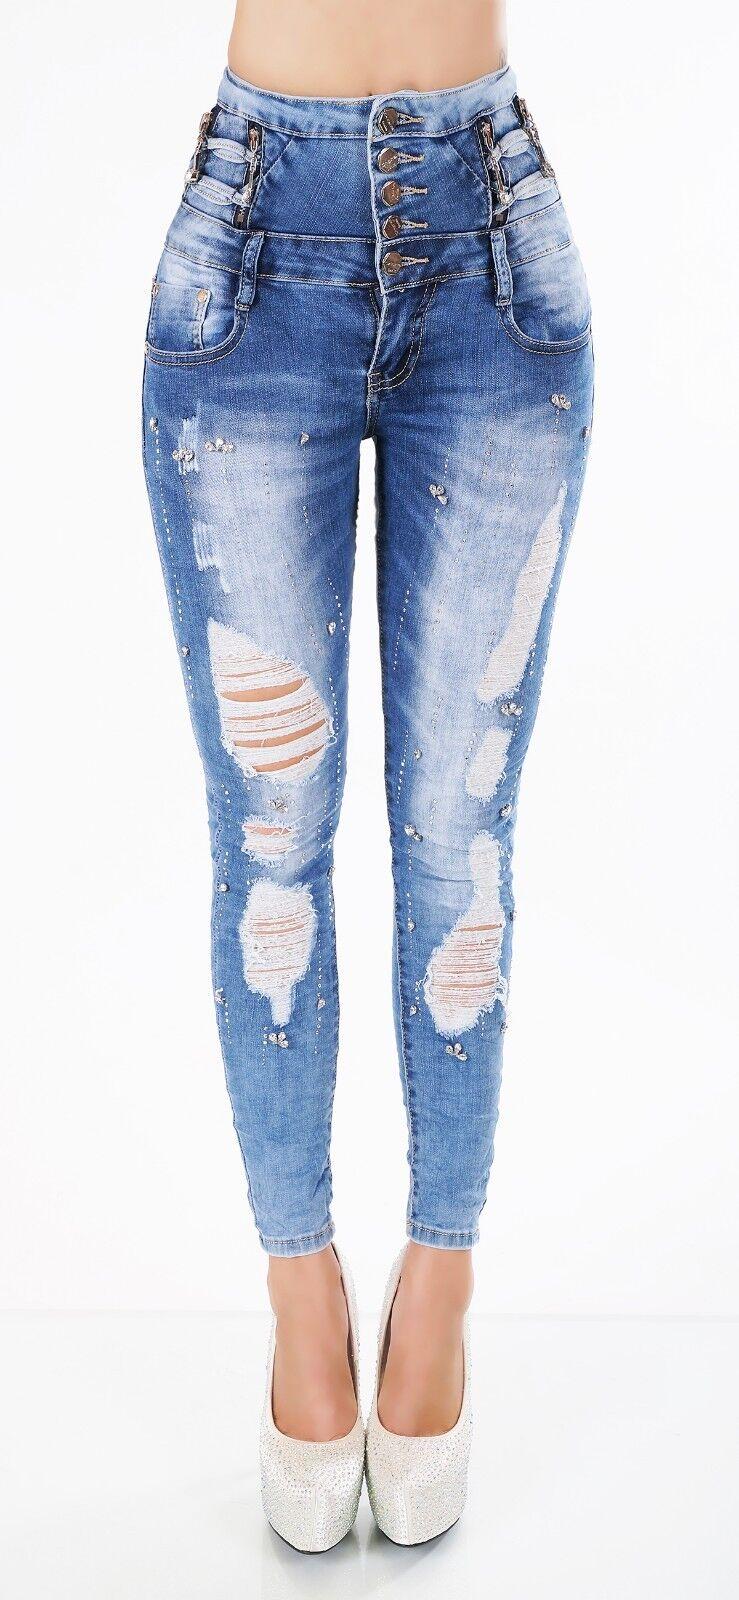 L'Original Femmes High Waist Jeans Pantalon Stretch Jean Cigarette XS-XL DETERIORE STRASS XS-XL Cigarette 5e191c